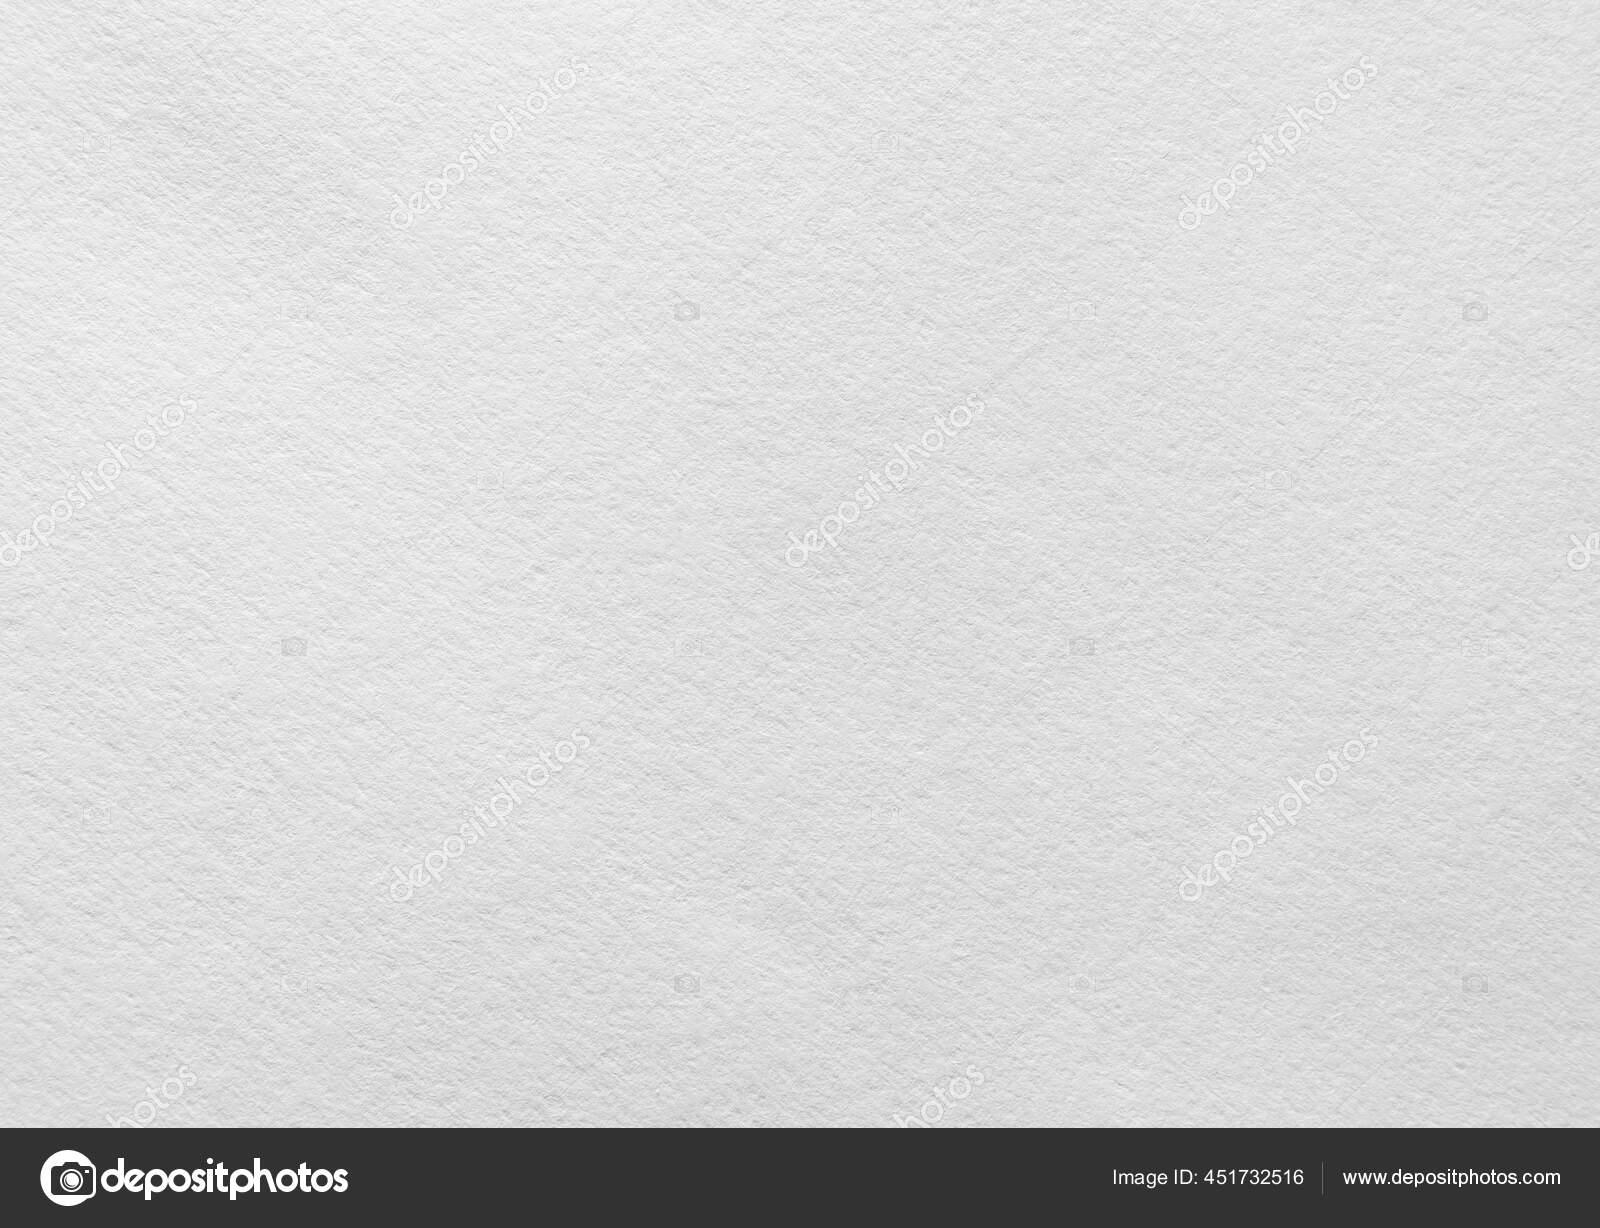 Latar Belakang Kertas Putih Tekstur Kertas Kosong Atau Kertas Dinding —  Stok Foto © Veresovich #451732516